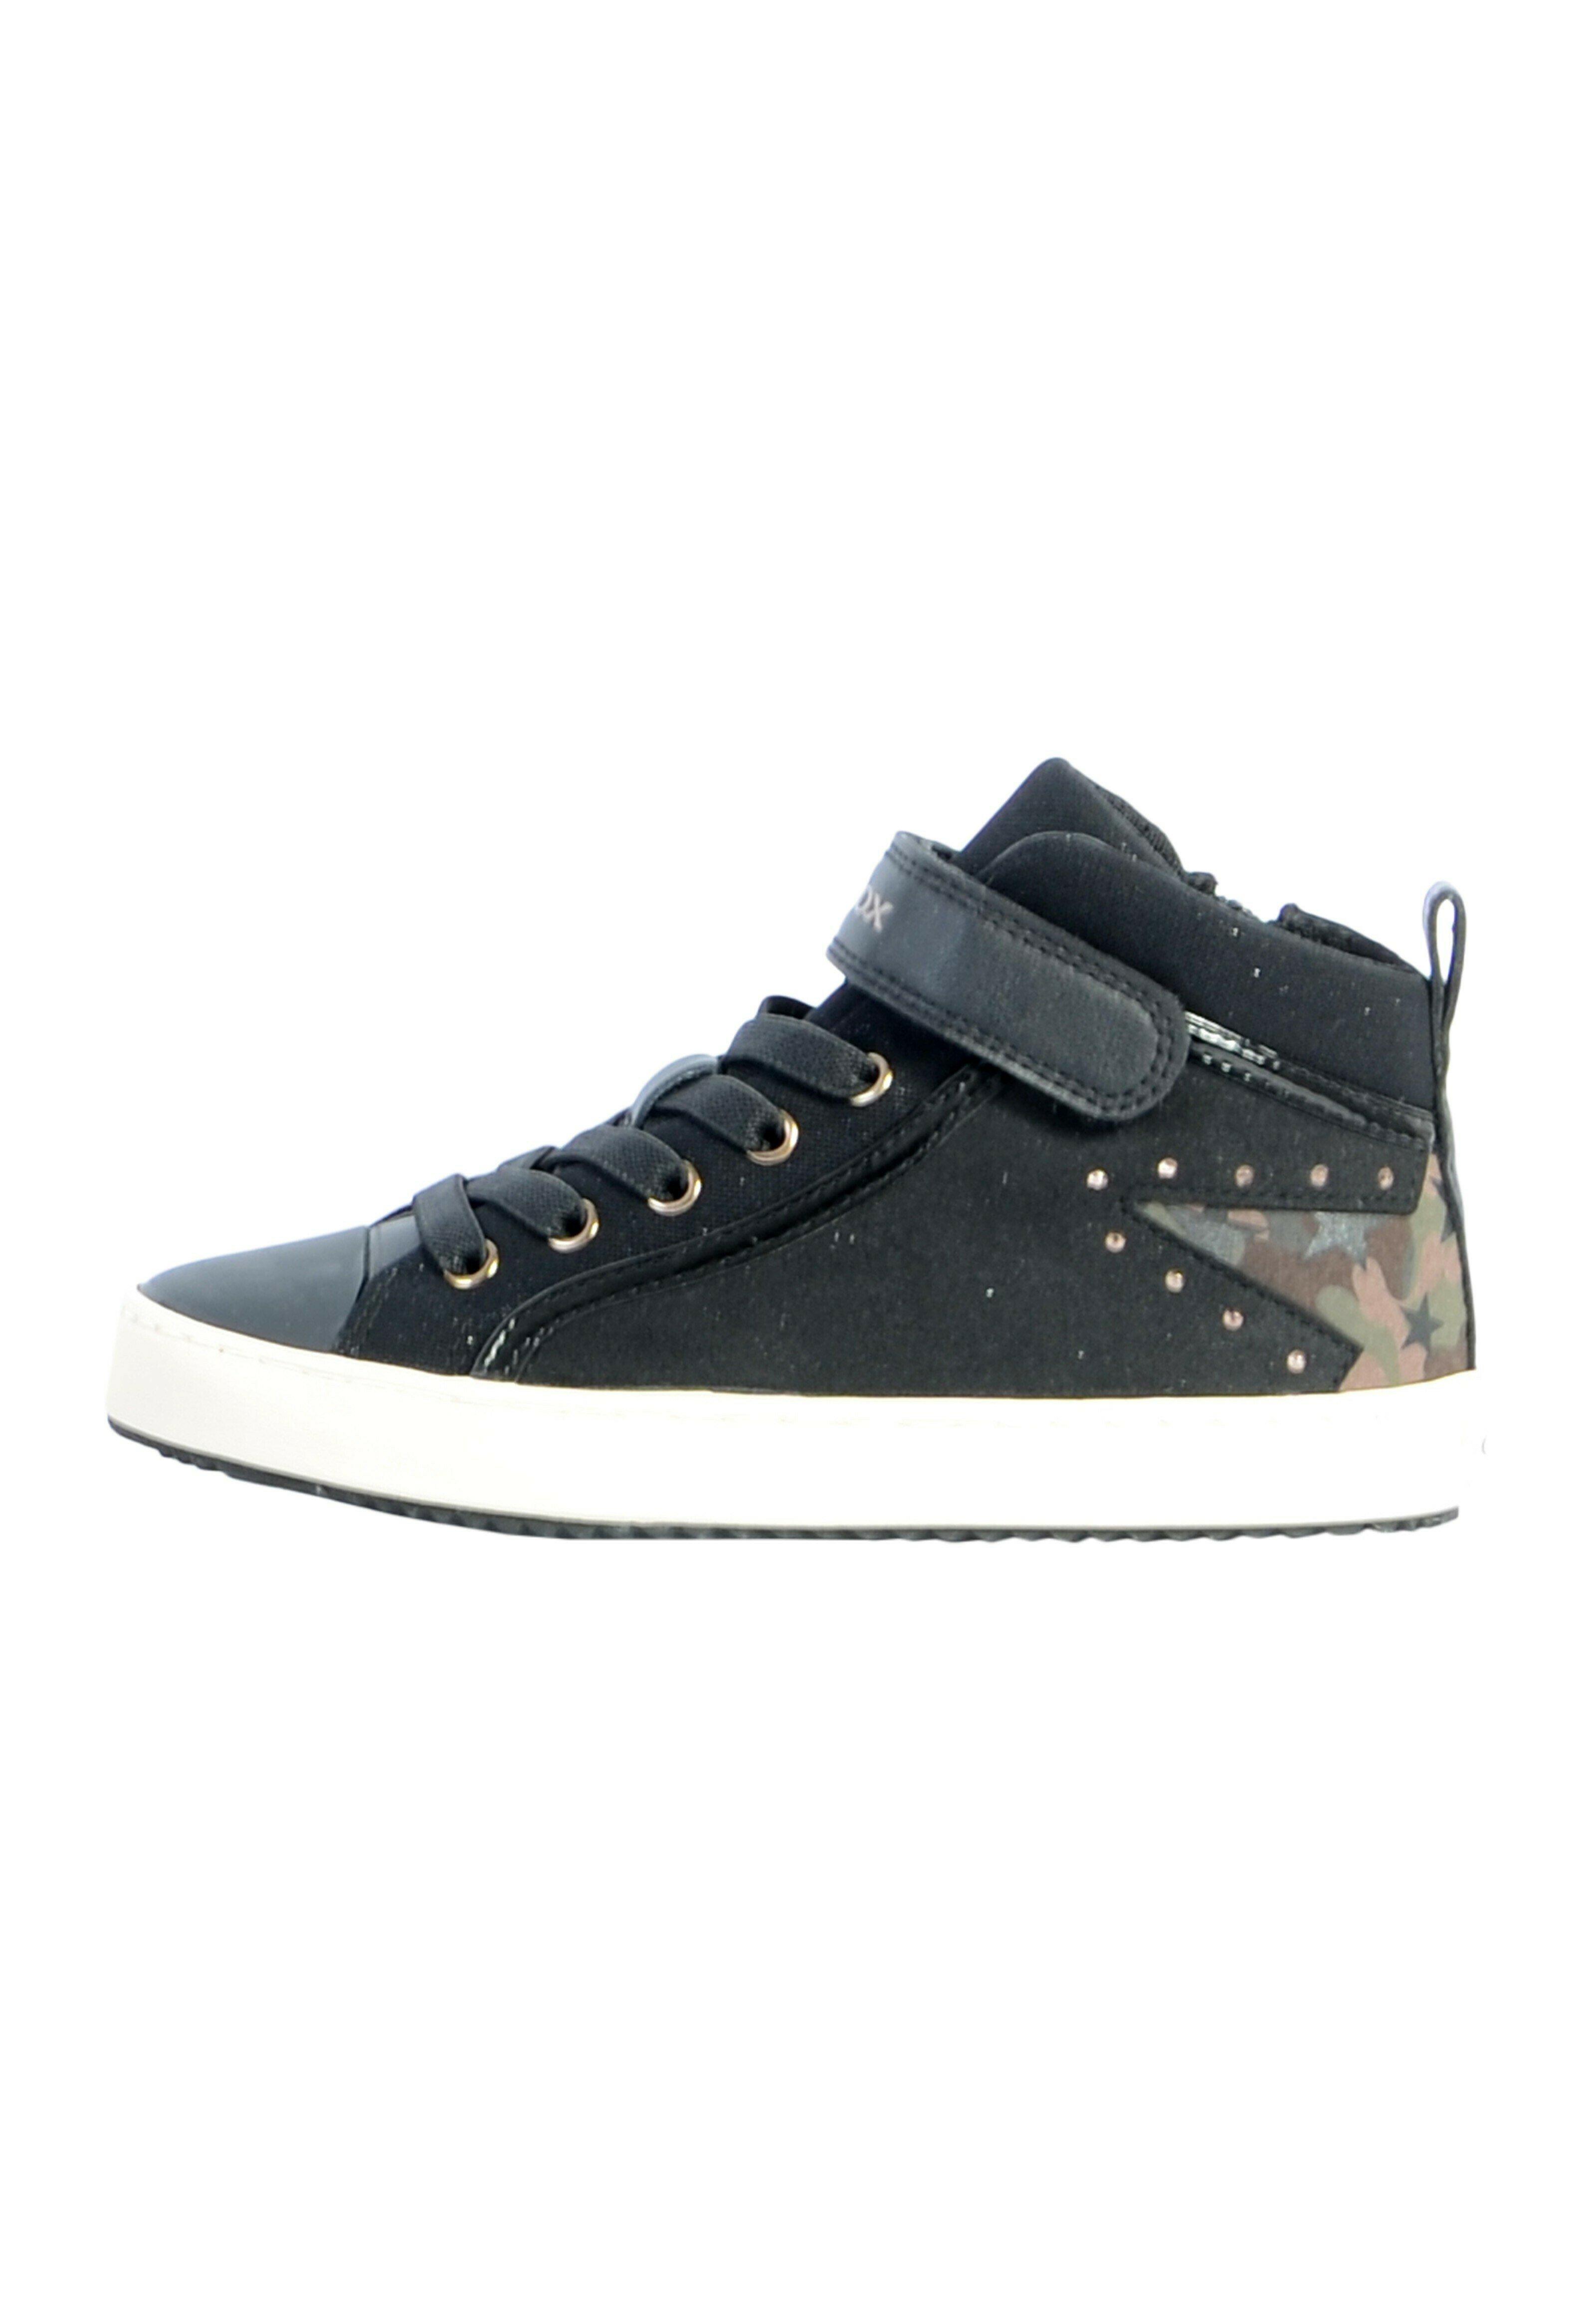 Enfant GEOX KALISPERA - Chaussures de skate